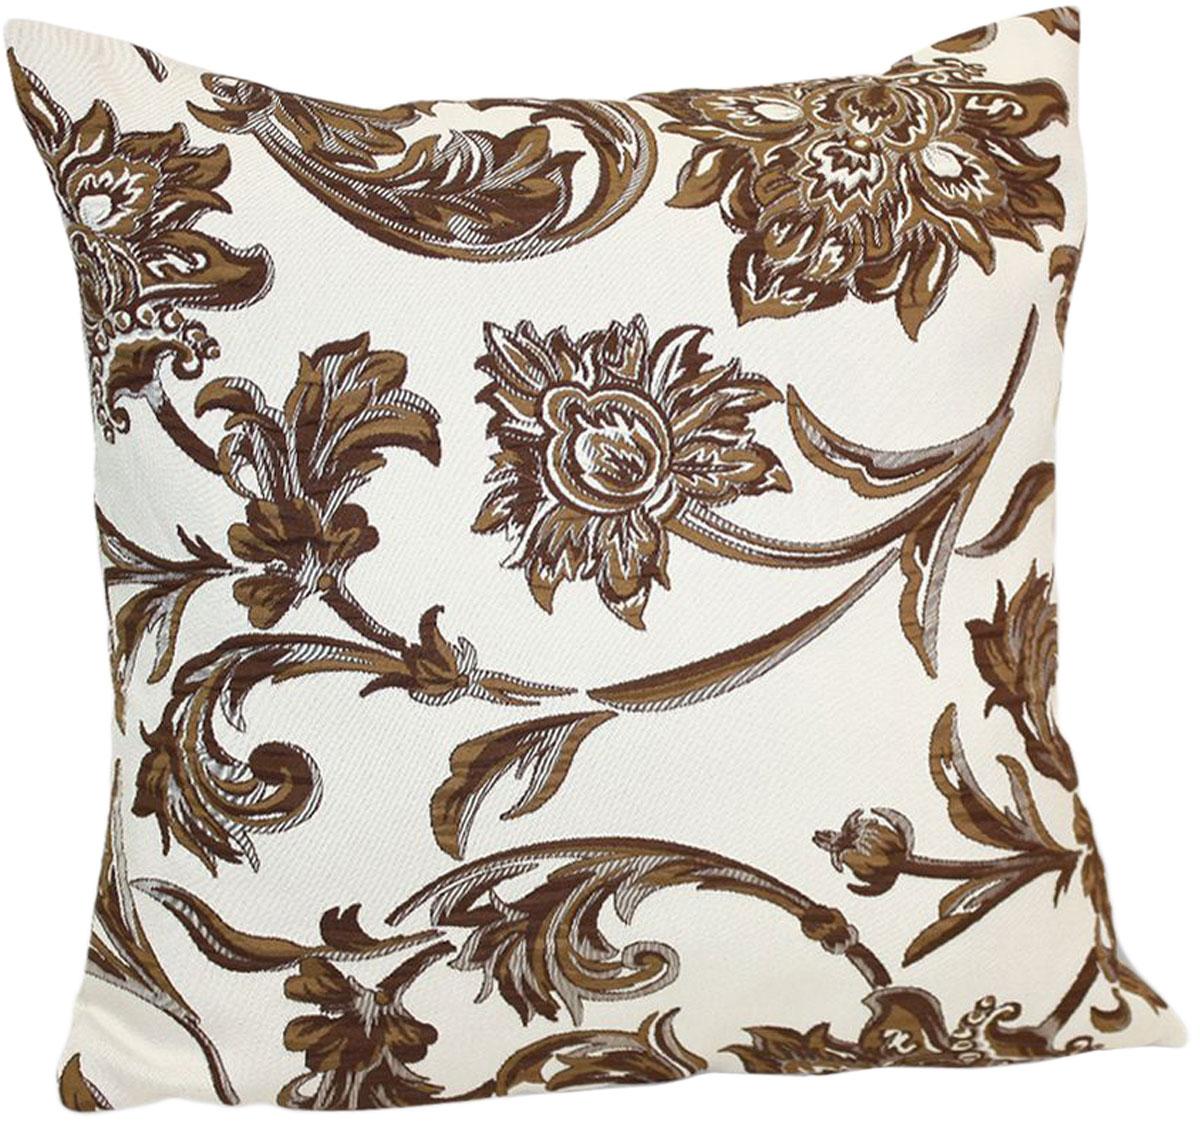 Подушка декоративная KauffOrt Руан, цвет: коричневый, 40 x 40 см